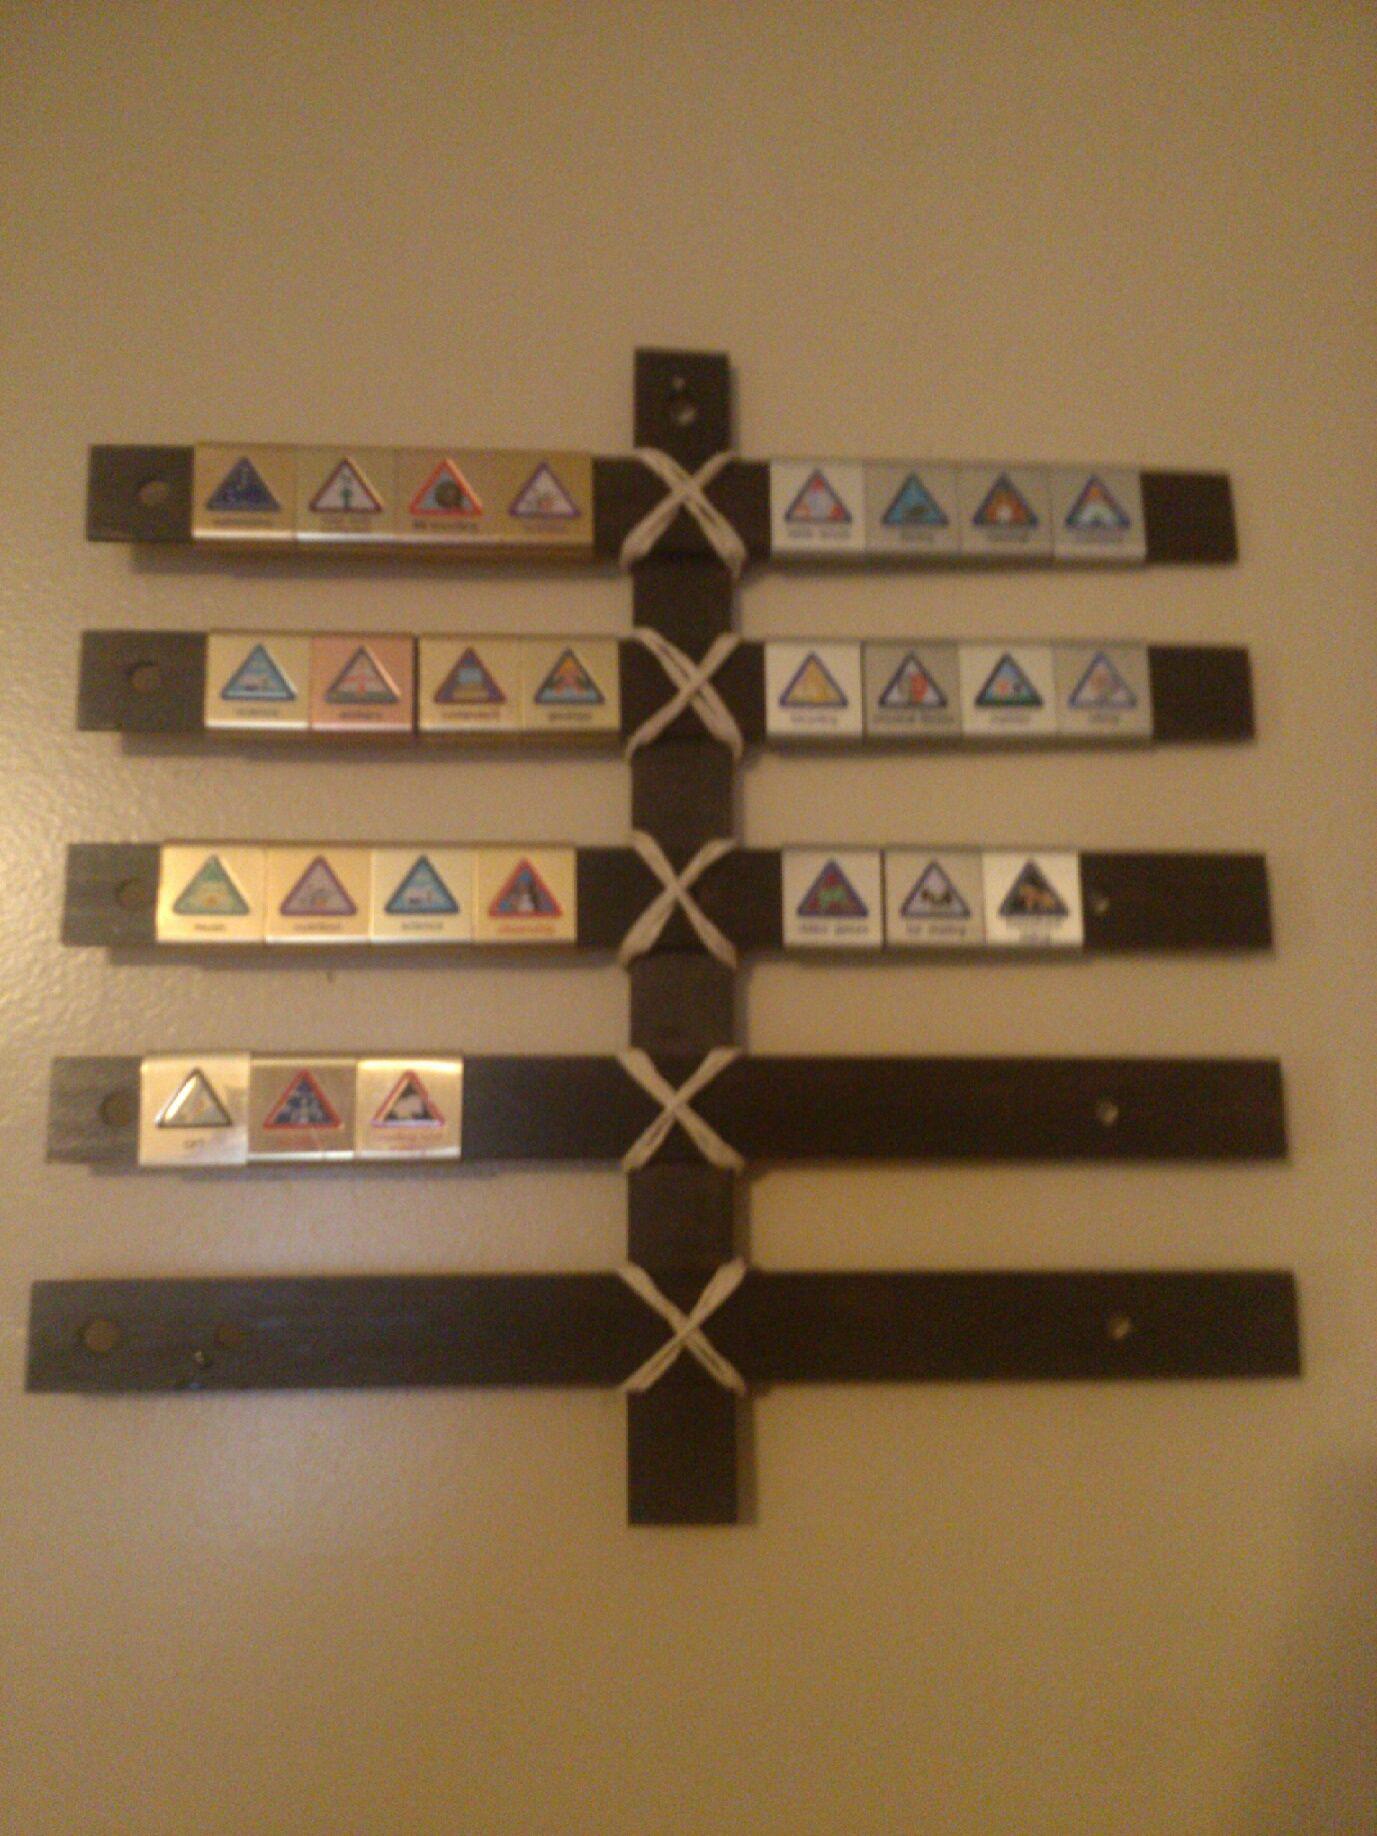 Diy Cub Scout Belt Loop Display For 1 50 Using Wooden